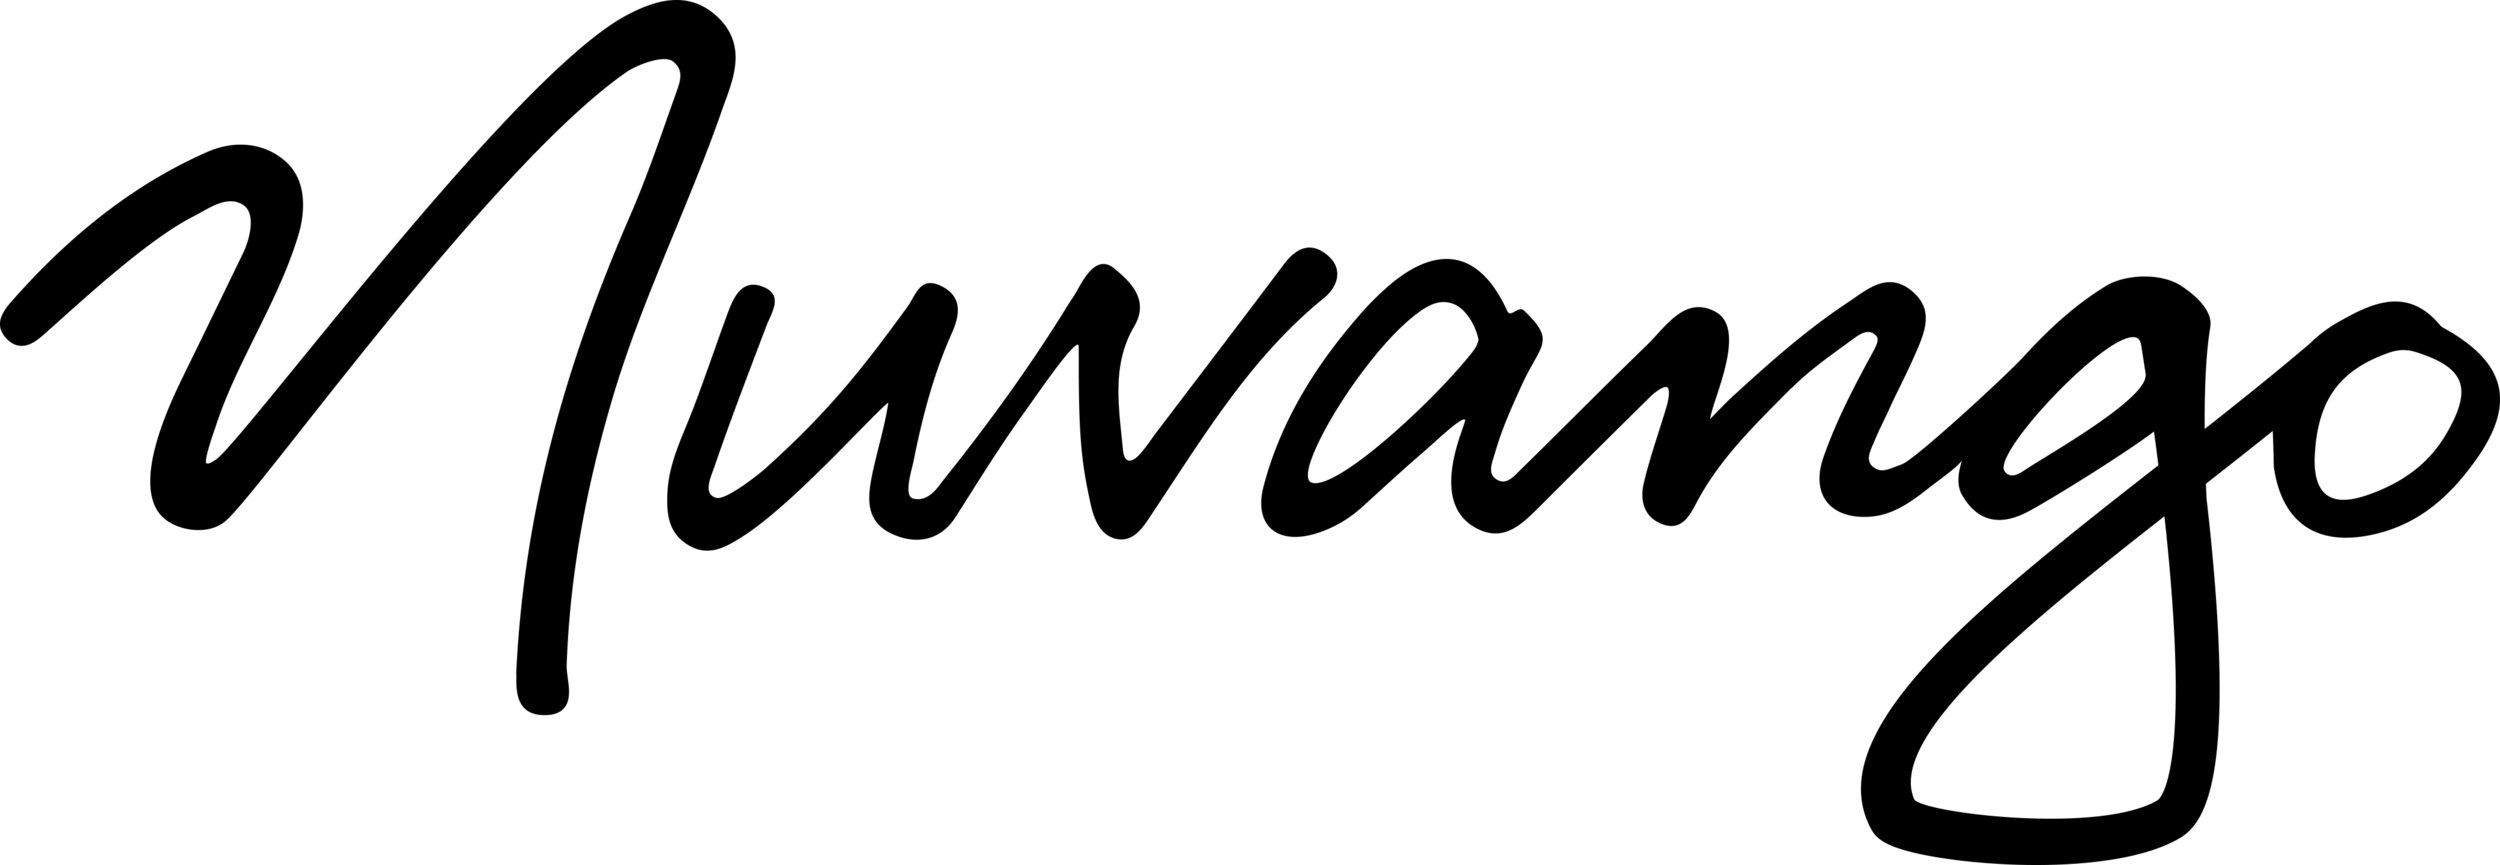 nuvango_logo_black.jpg